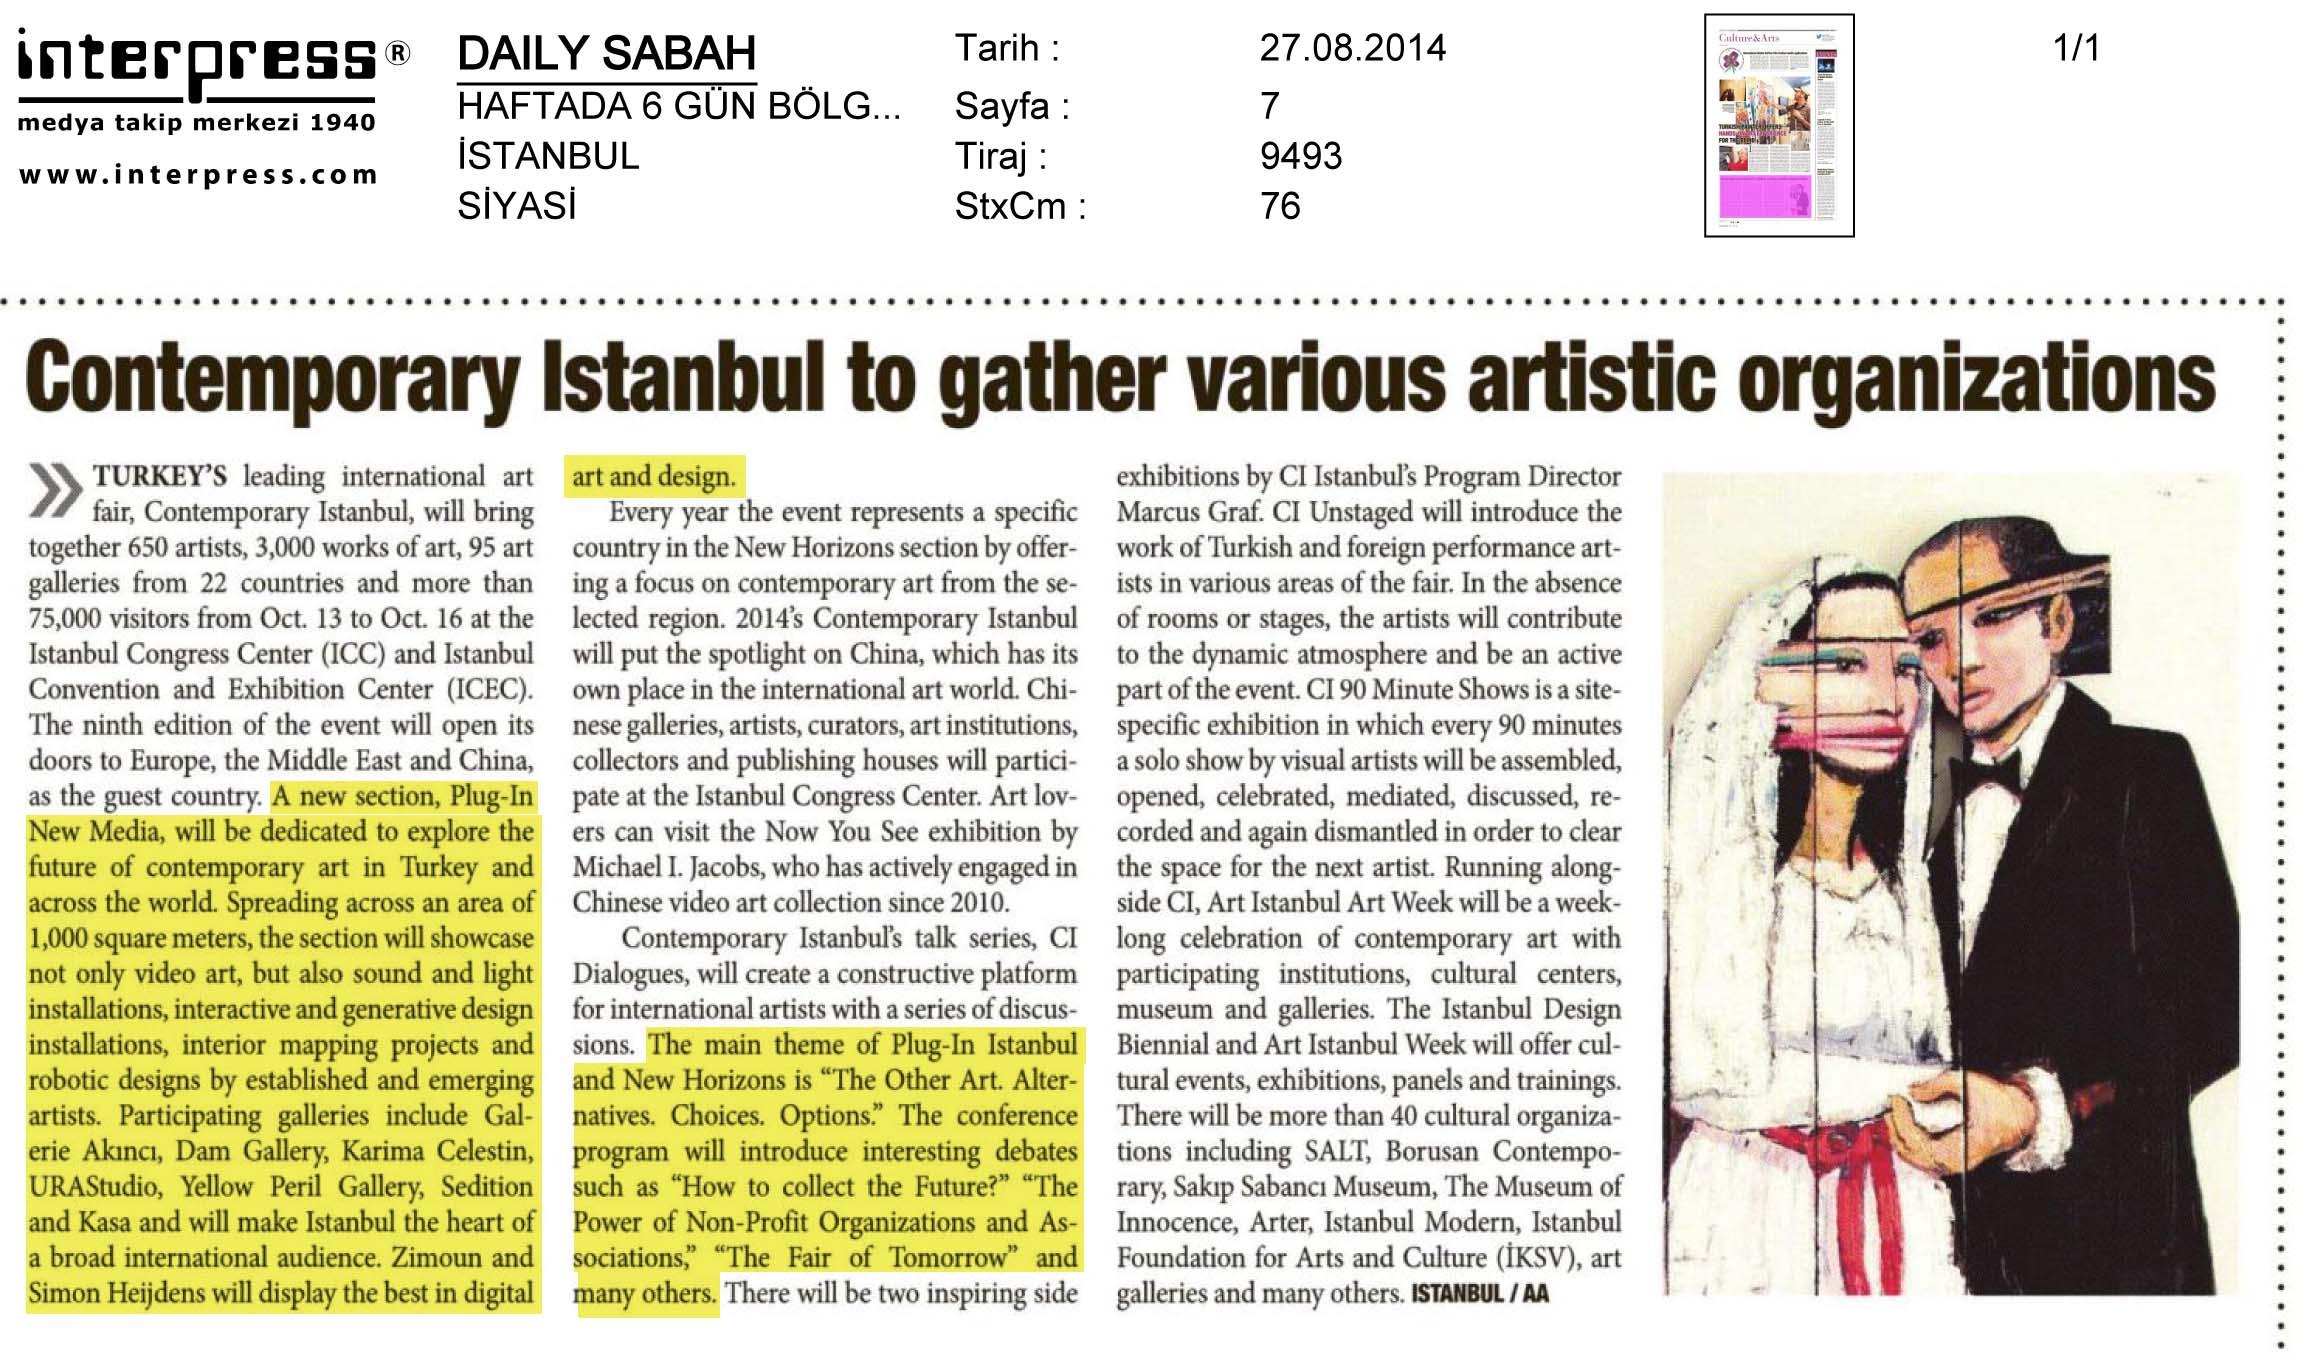 Daily Sabah - Bölgesel Haftada 6 gün gazetet  27-08.jpg